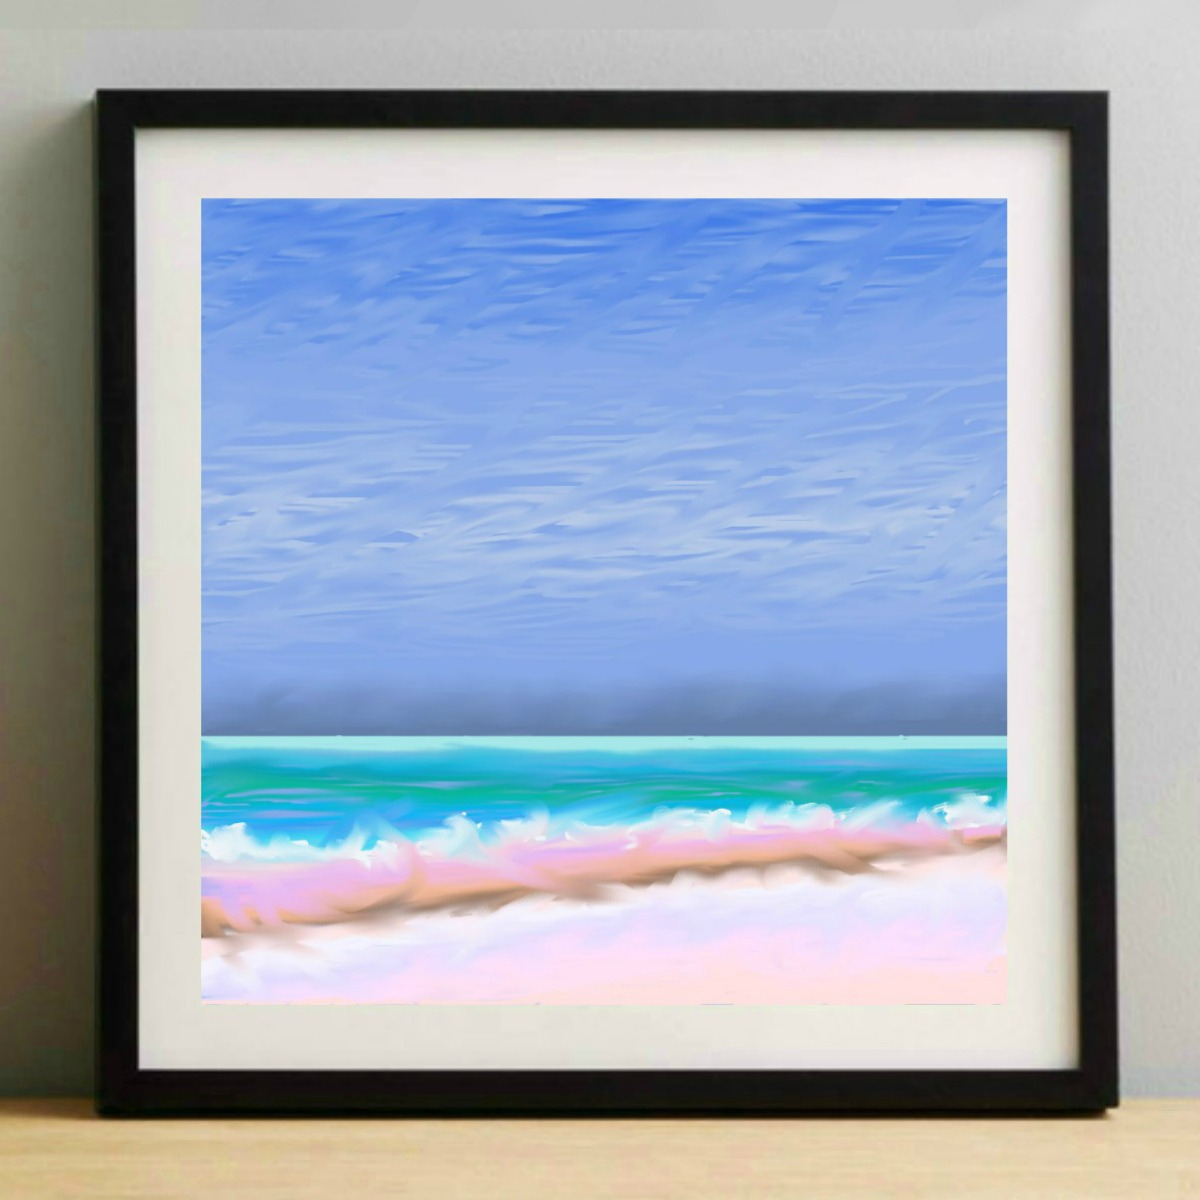 Sea and Sand 2